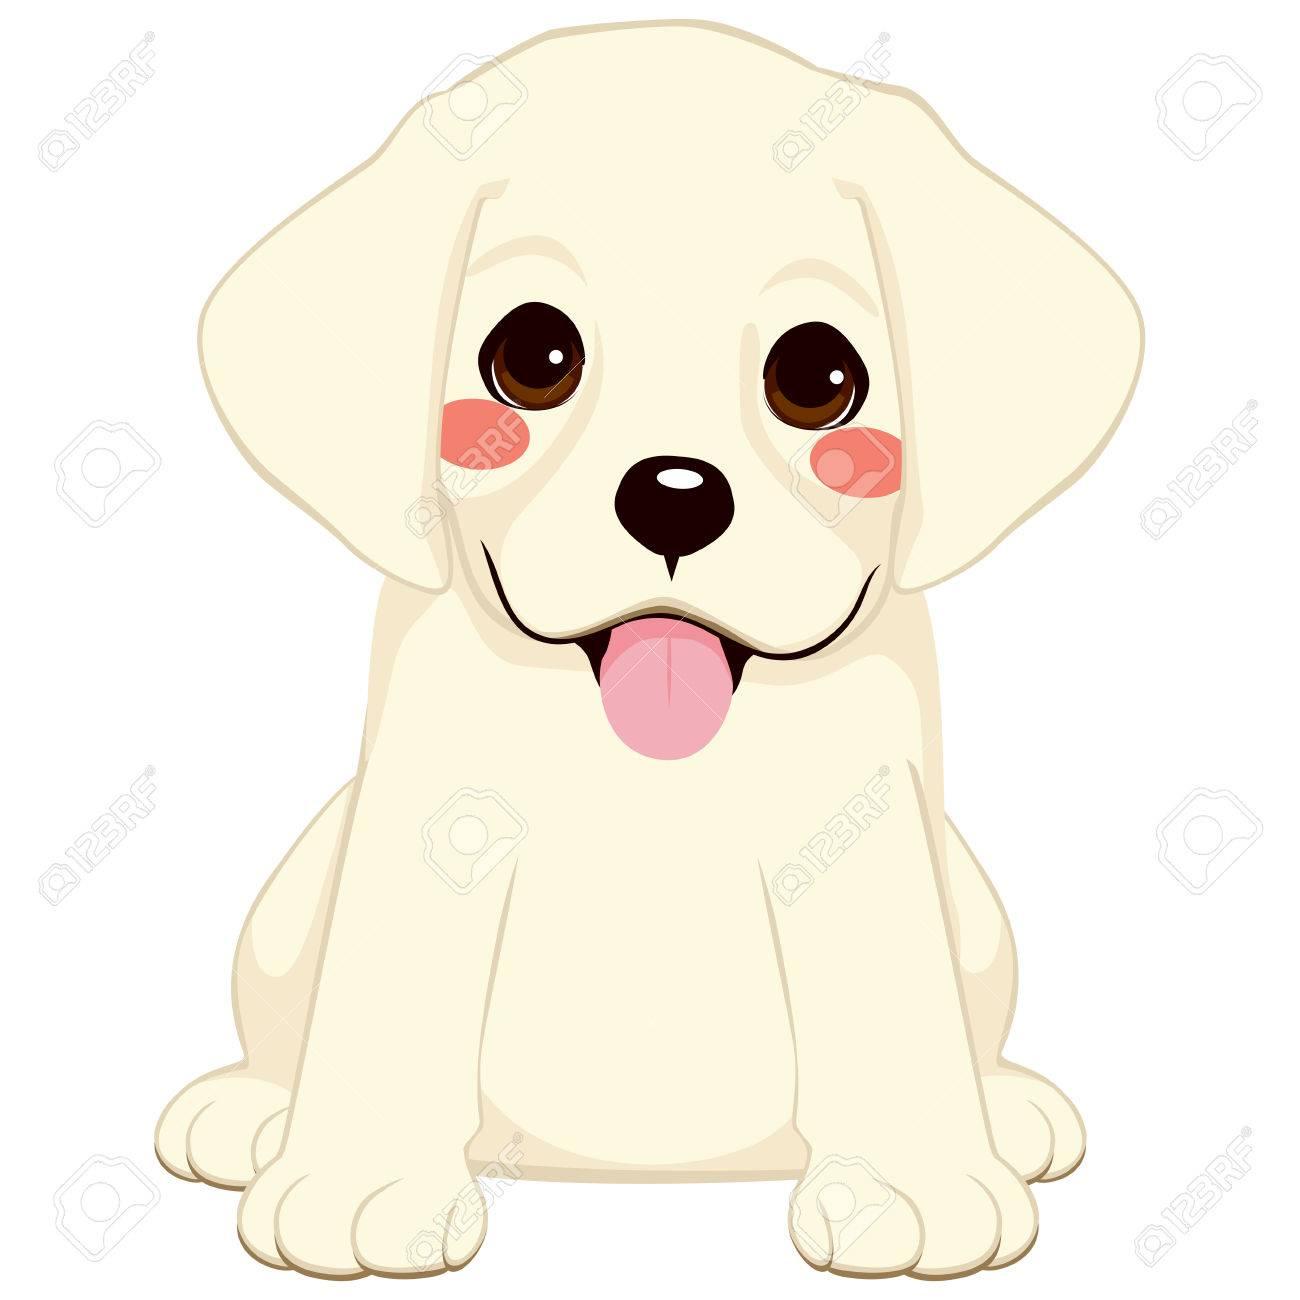 Cute White Labrador Golden Retriever Puppy Illustration Royalty Free